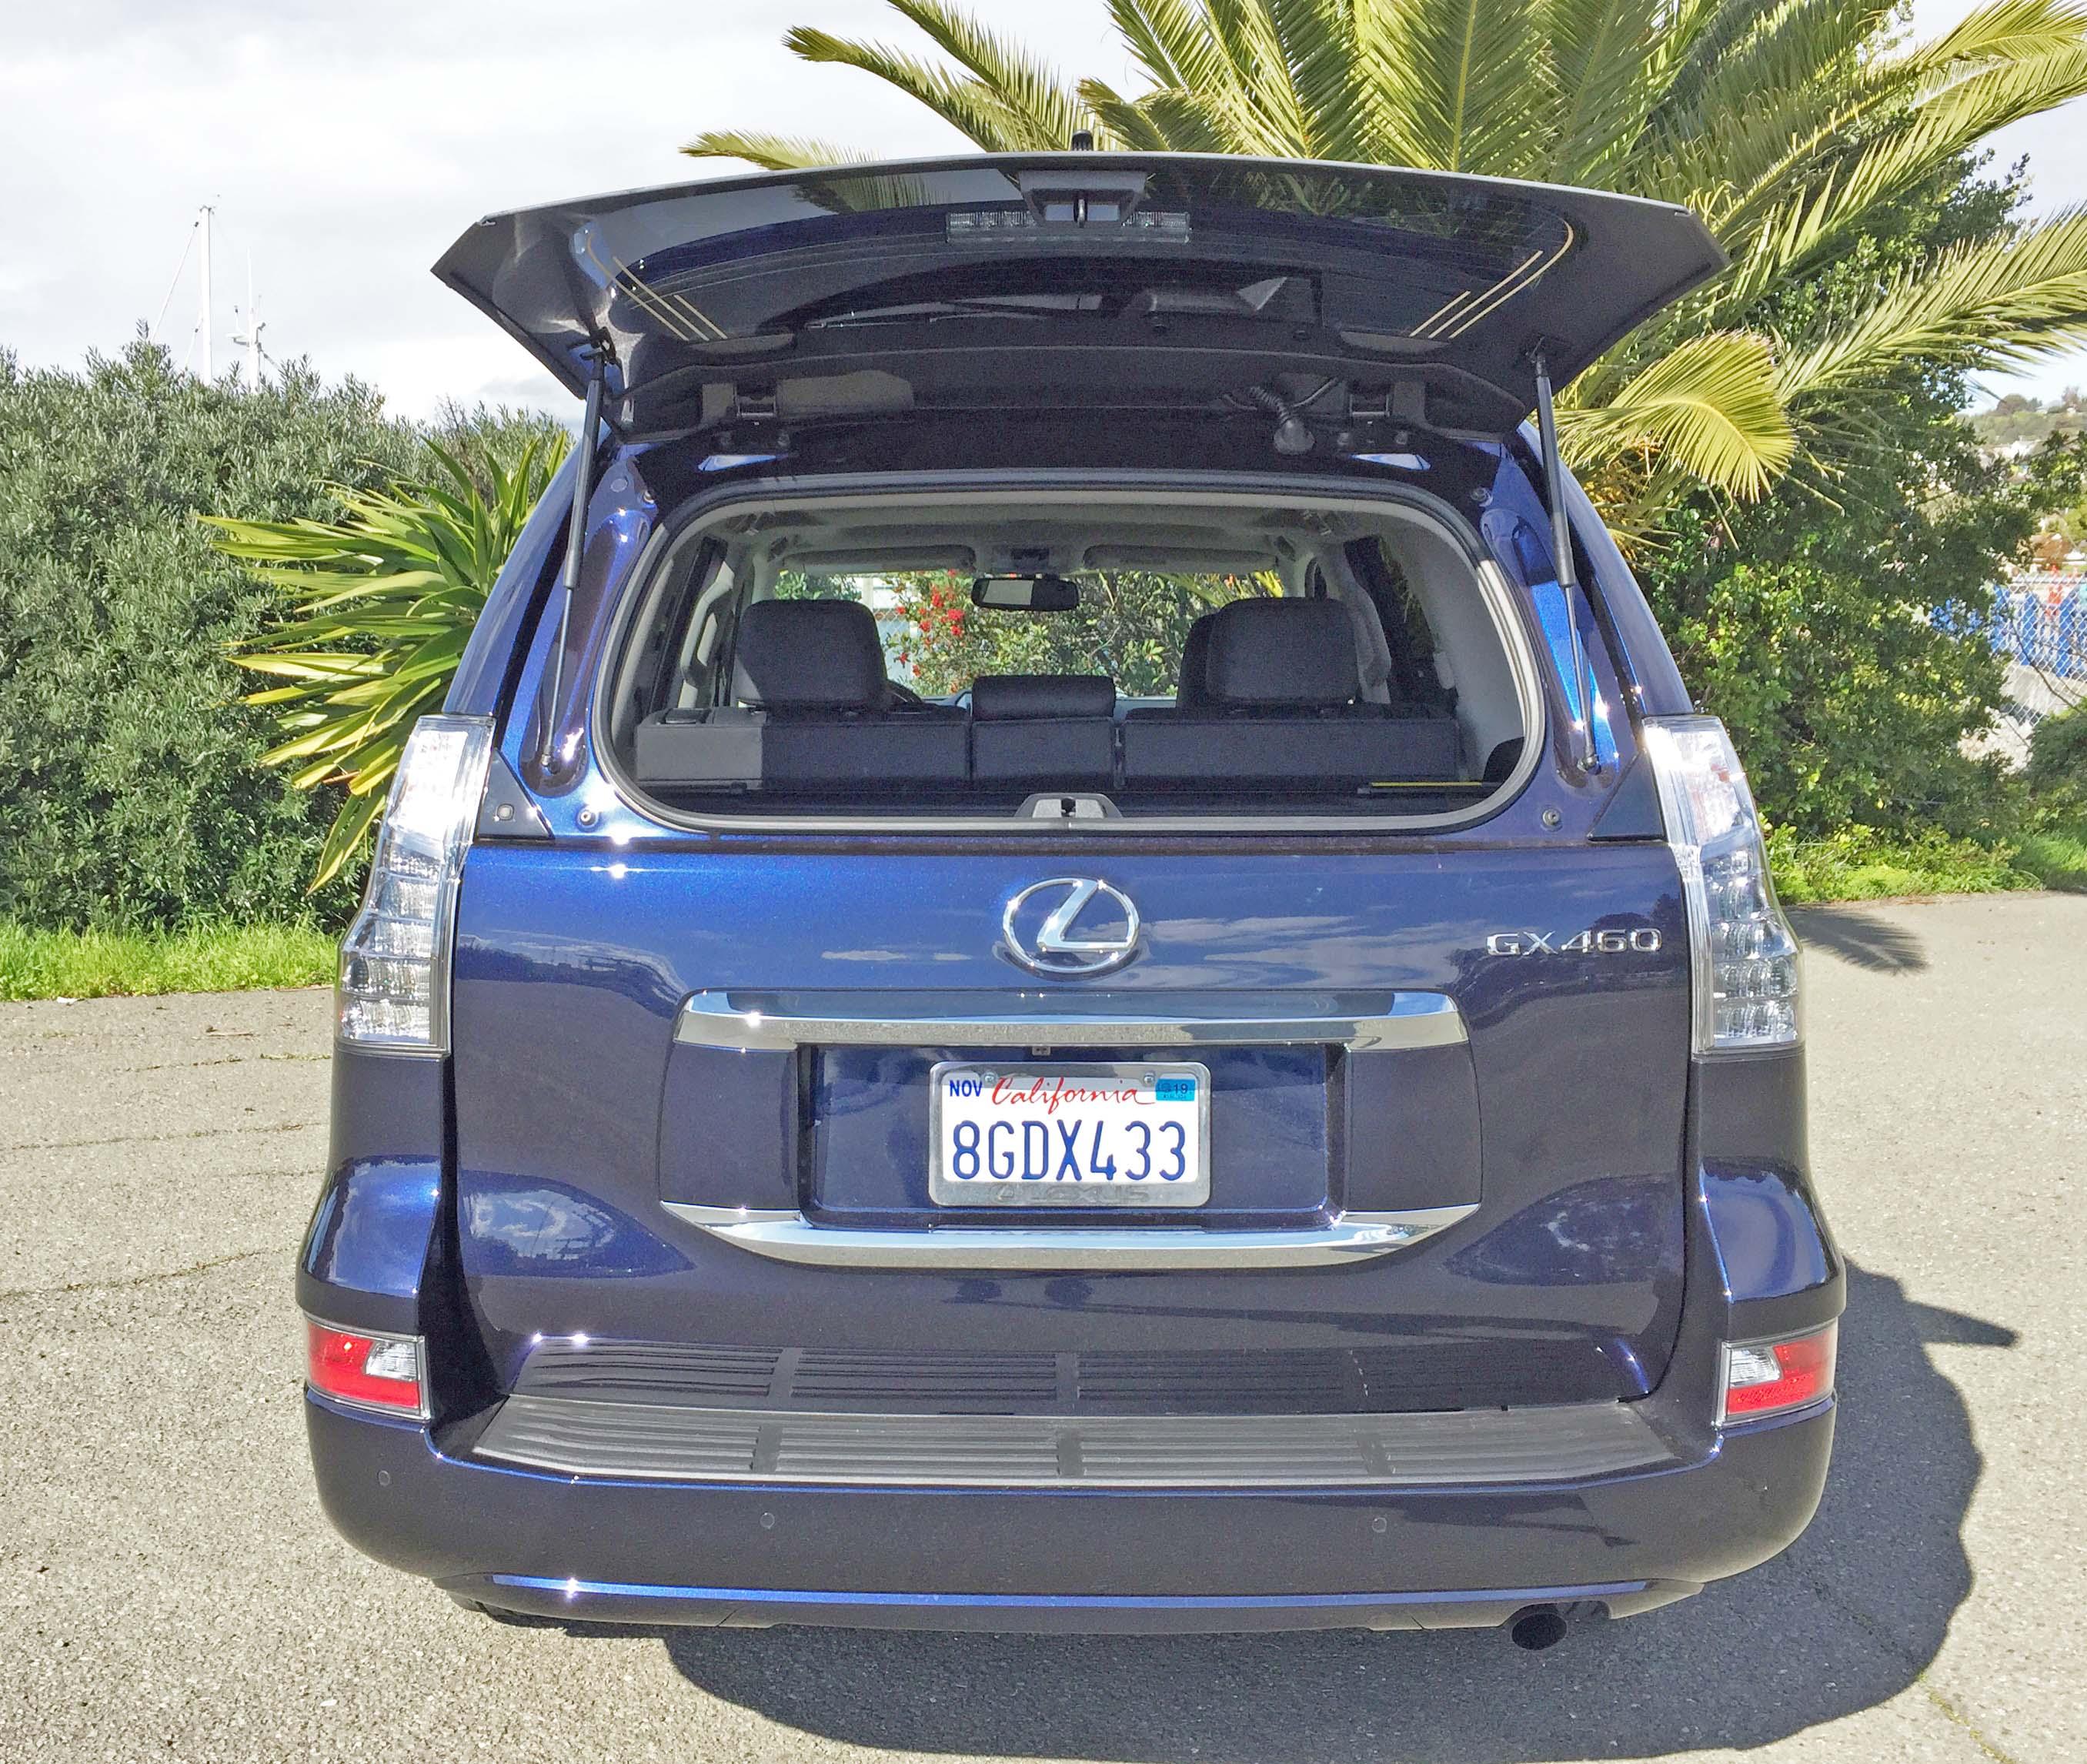 2019 Lexus GX 460 Luxury Test Drive